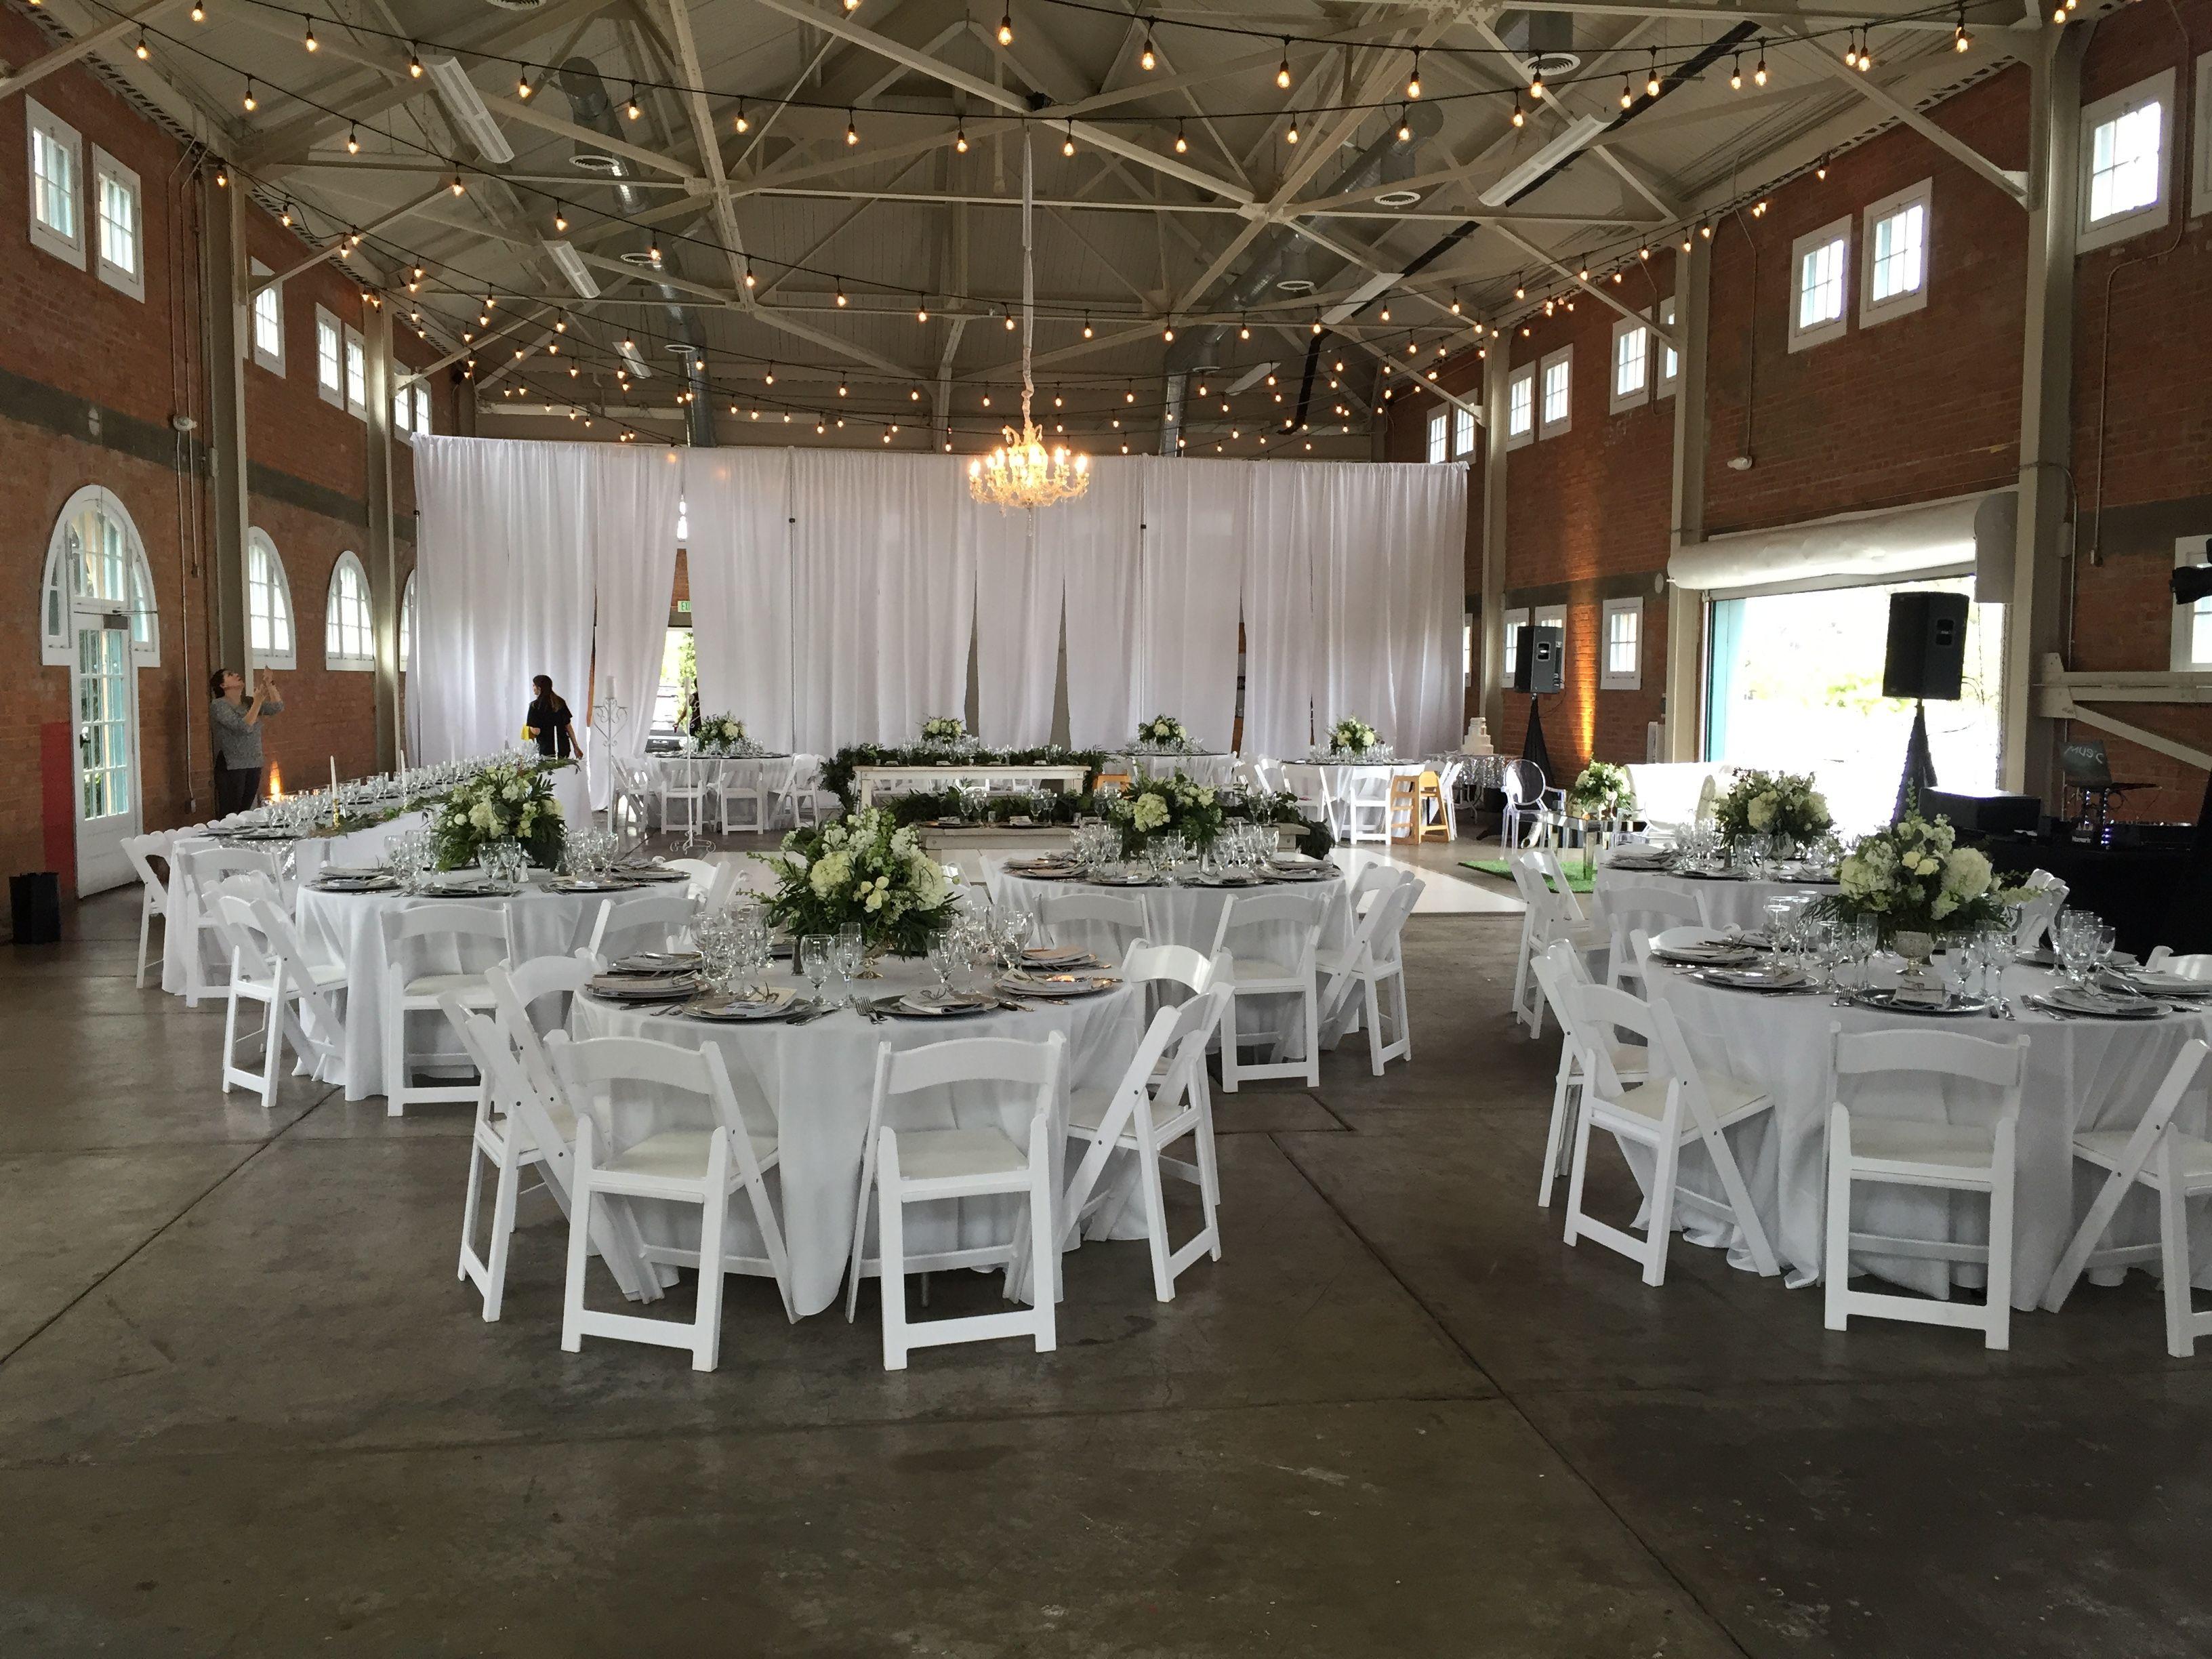 Brick 828 Wedding Venue In Liberty Station San Diego Sandiego Sandiegowedding Warehousewedding San Diego Wedding Venues Warehouse Wedding Industrial Wedding